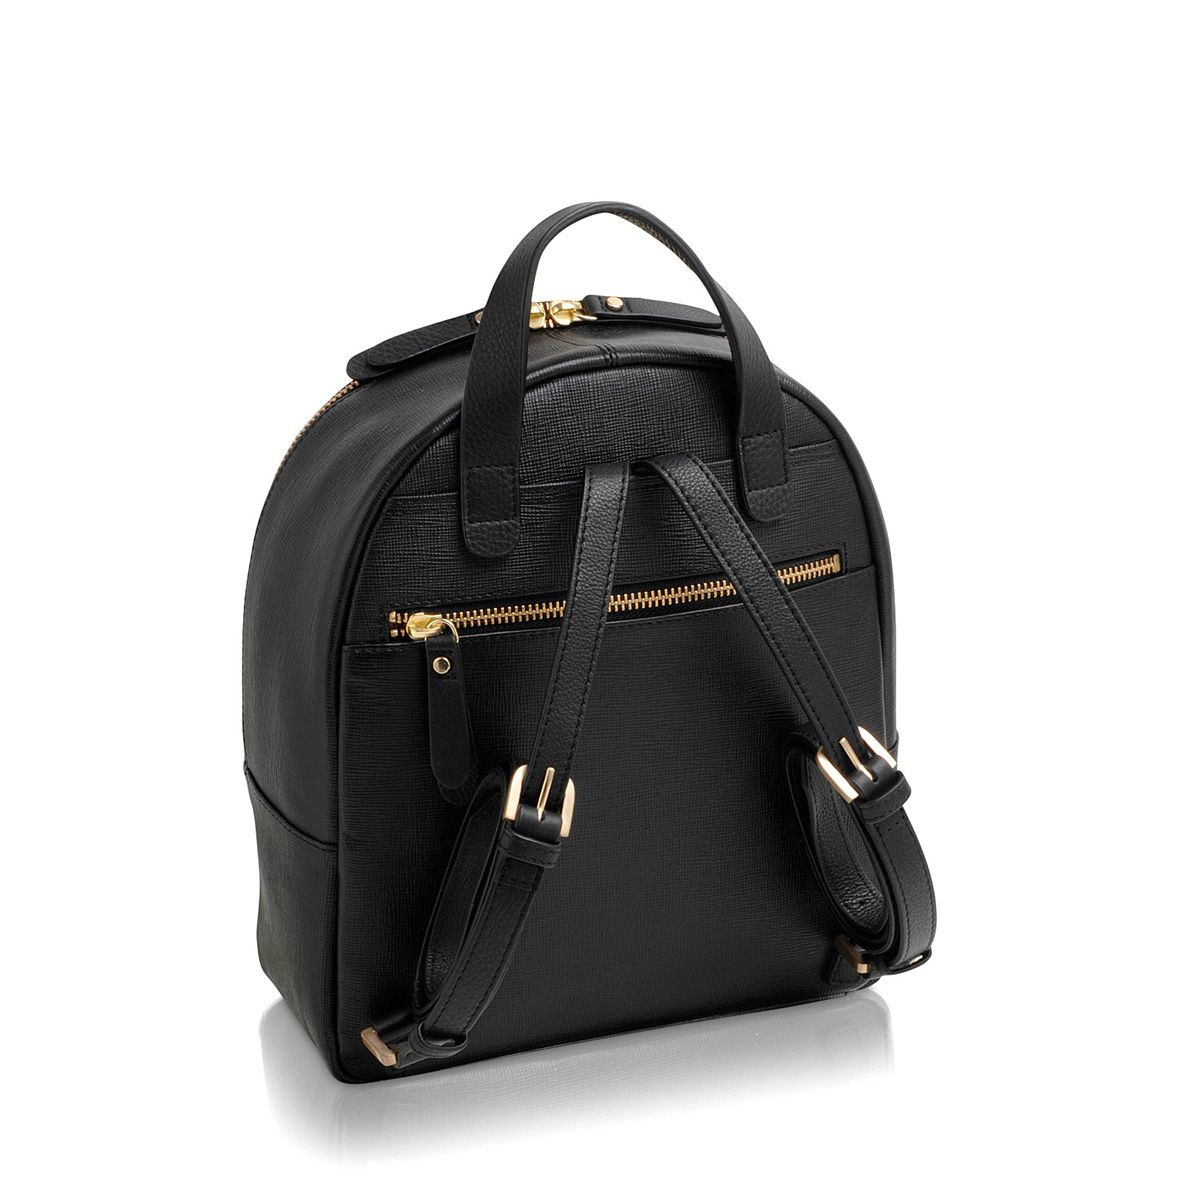 Radley Leather Herbarium Black Medium Backpack